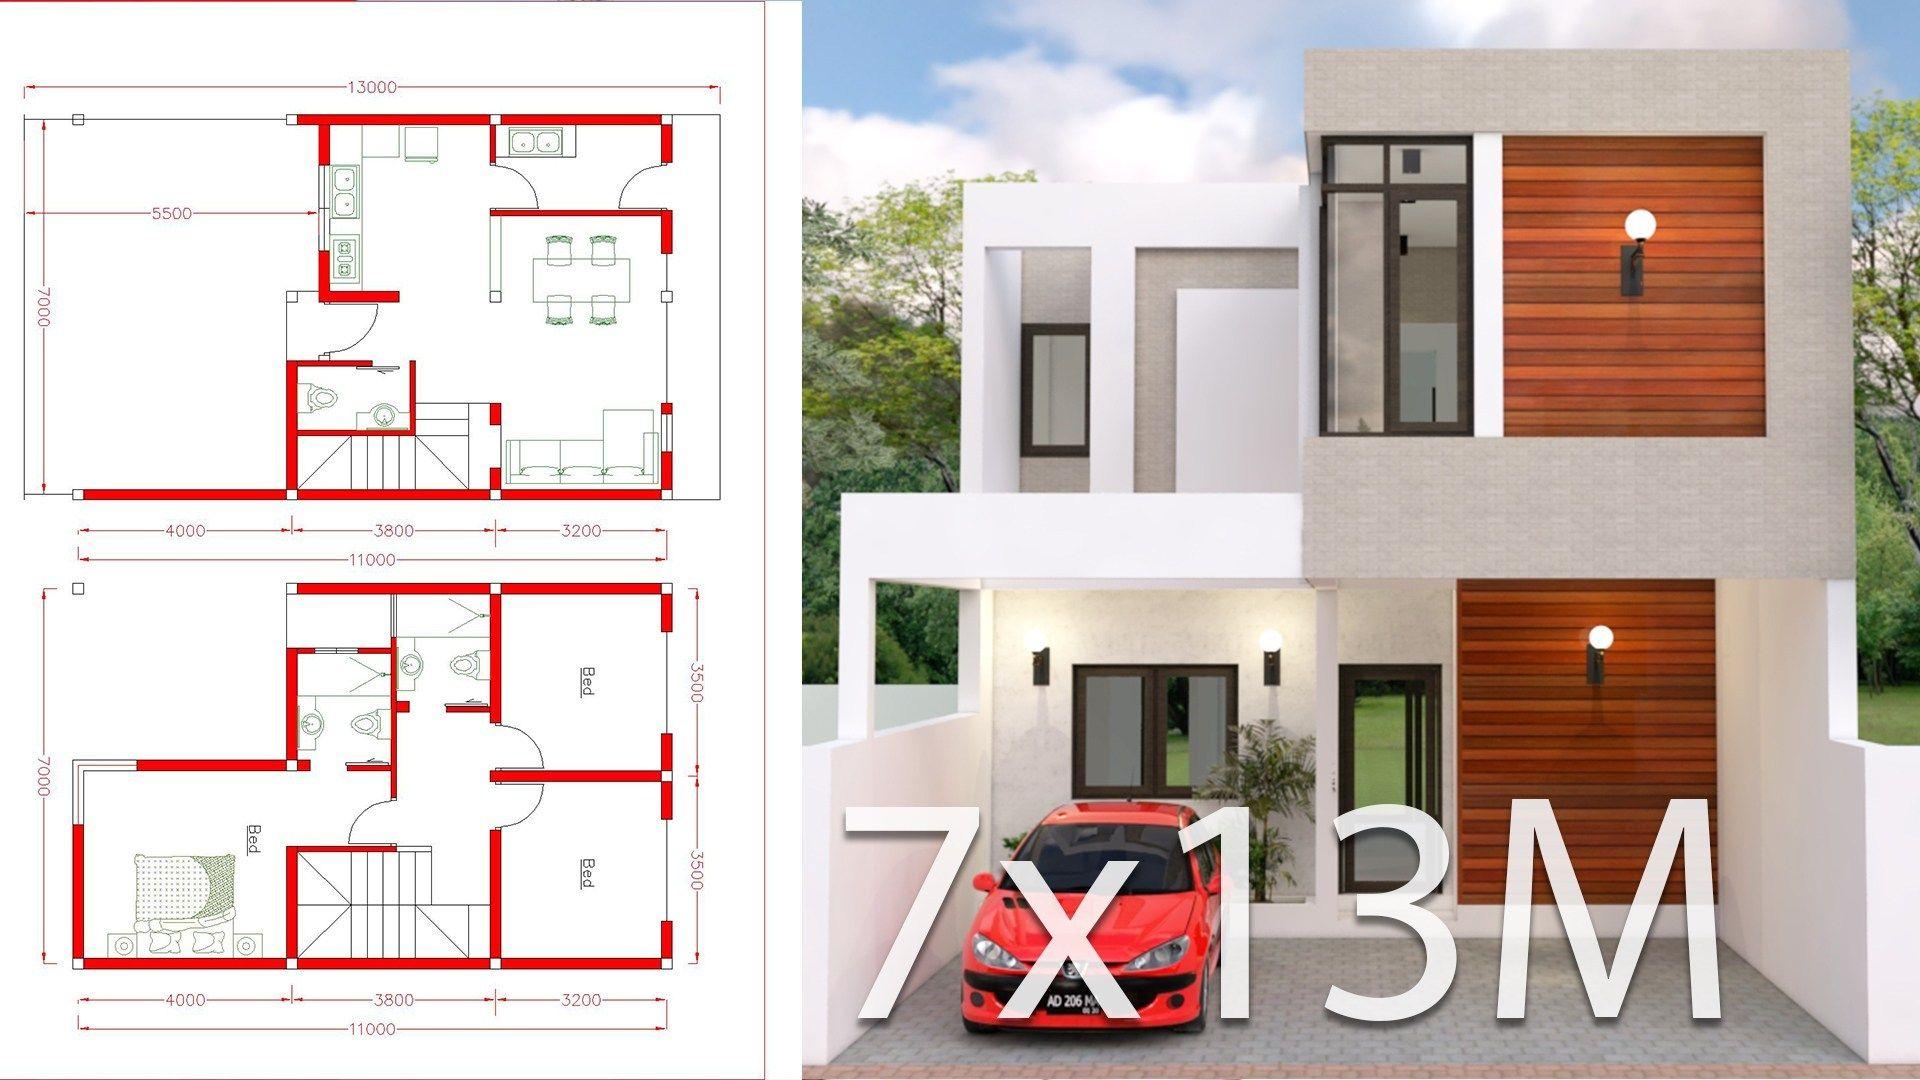 House Design Plan 7x13m With 3 Bedrooms Samphoas Com Small House Design House Layout Plans Duplex House Plans